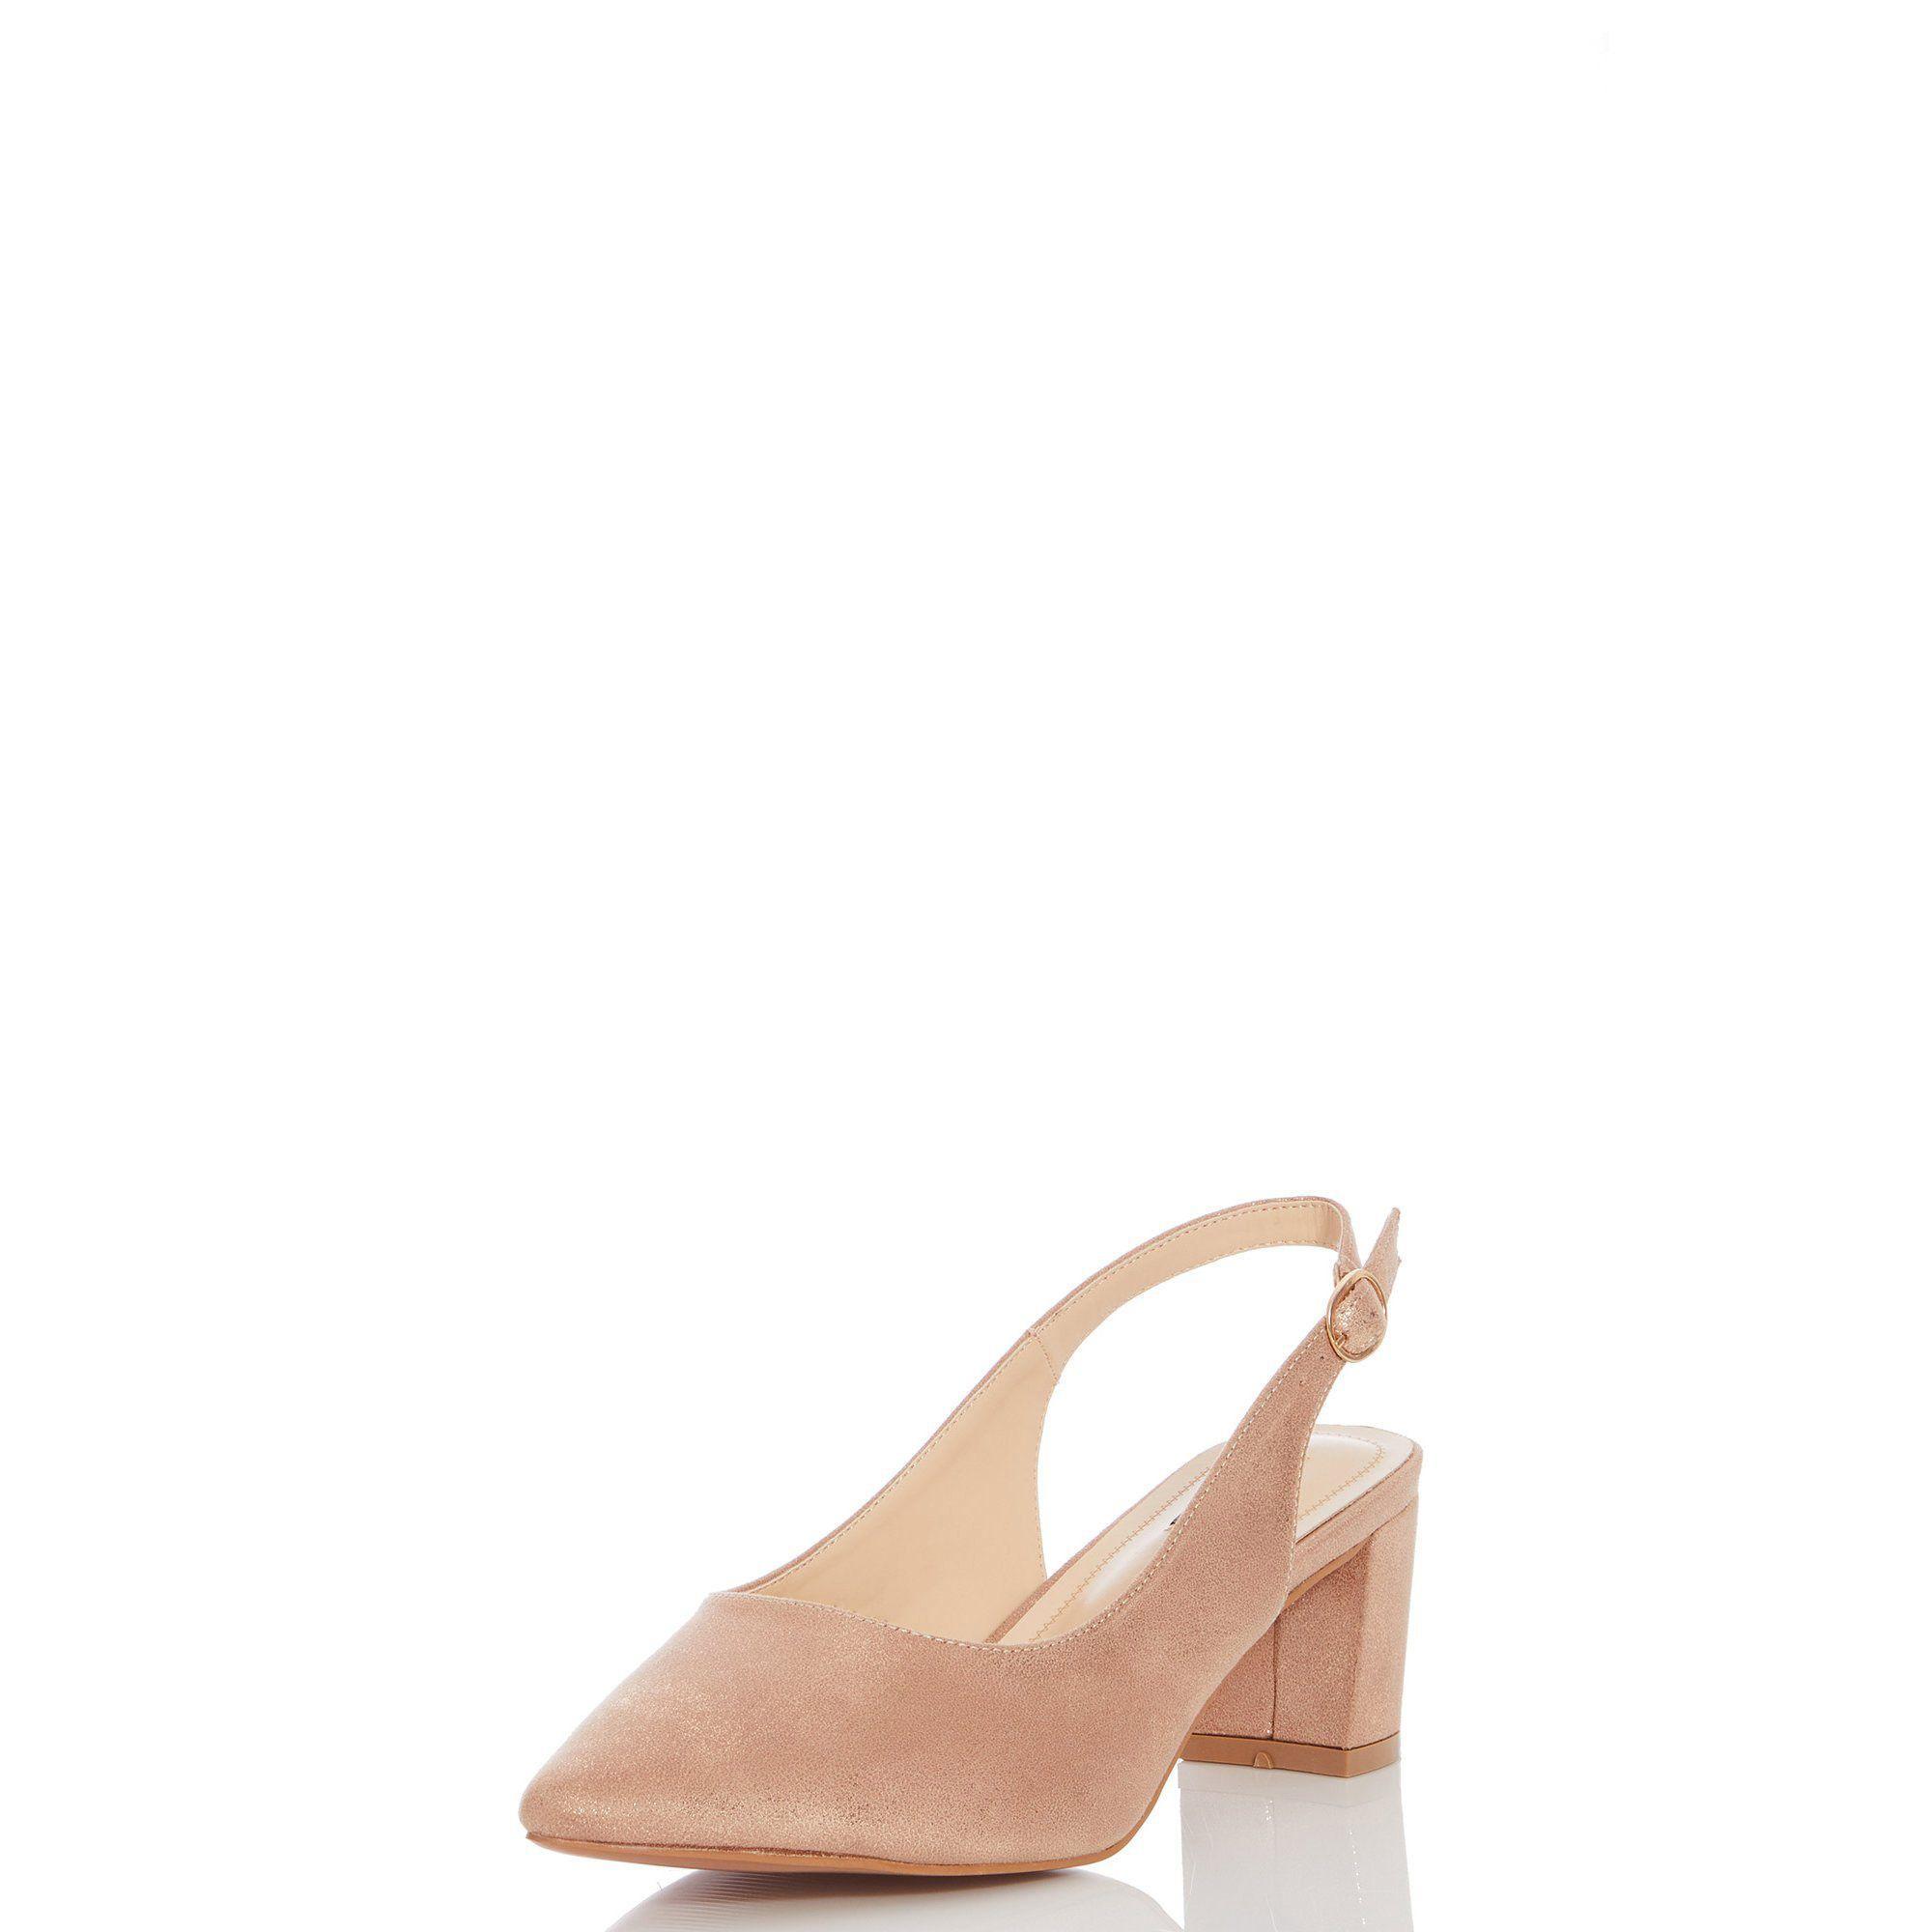 0d7656c1e18a Quiz - Metallic Camel Shimmer Slingback Low Heel Shoes - Lyst. View  fullscreen